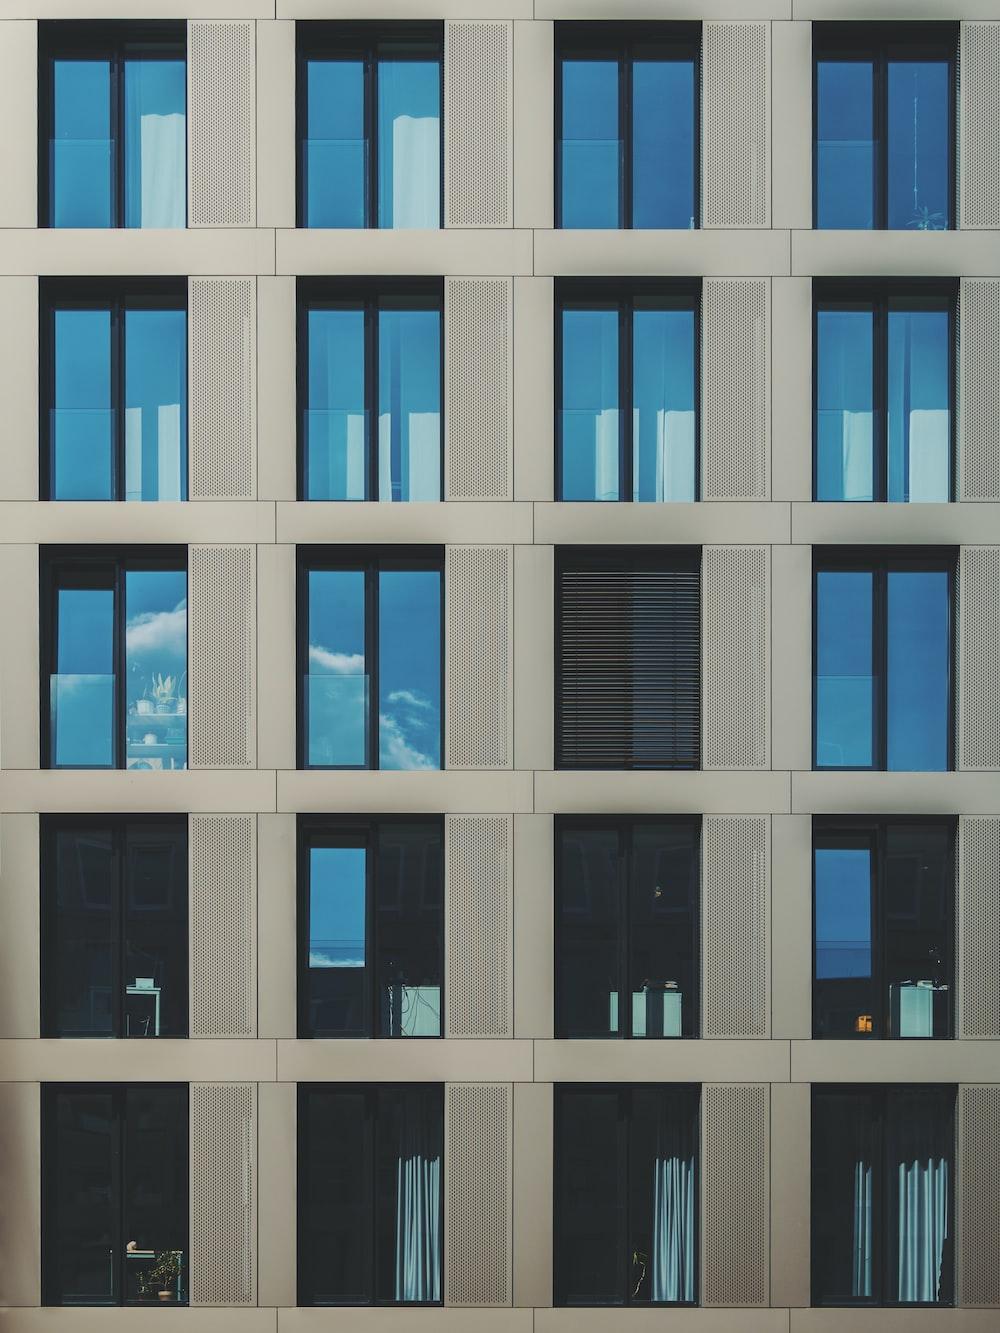 buildings illustration